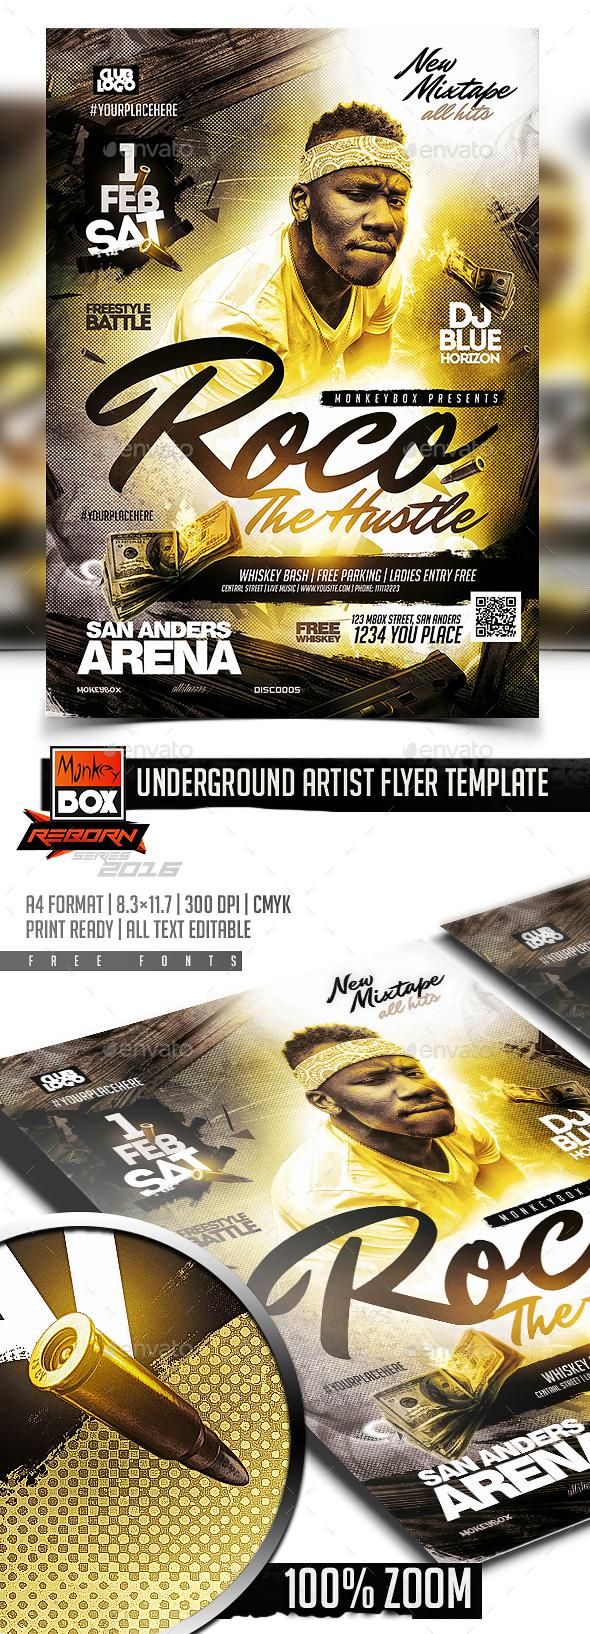 Underground Artist Flyer Template - Flyers Print Templates